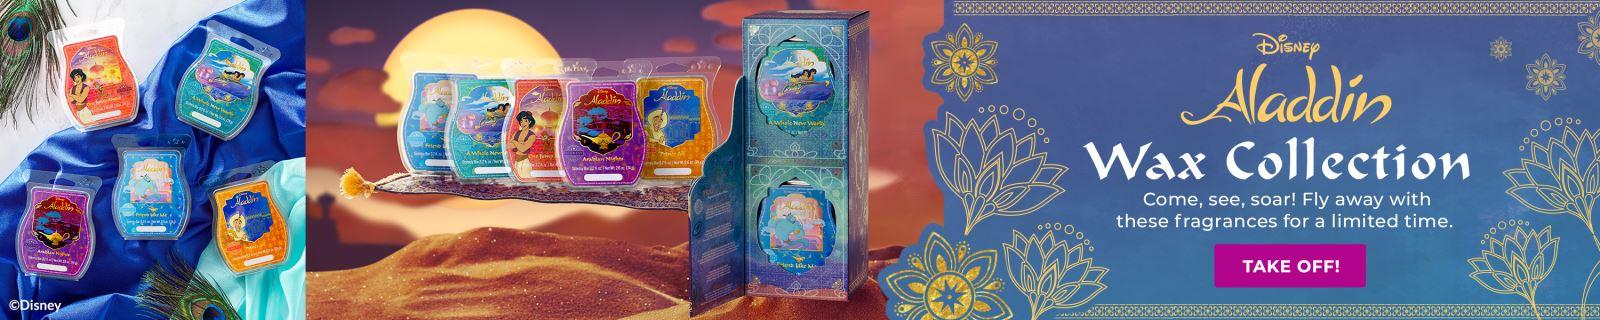 Aladdin Wax Collection